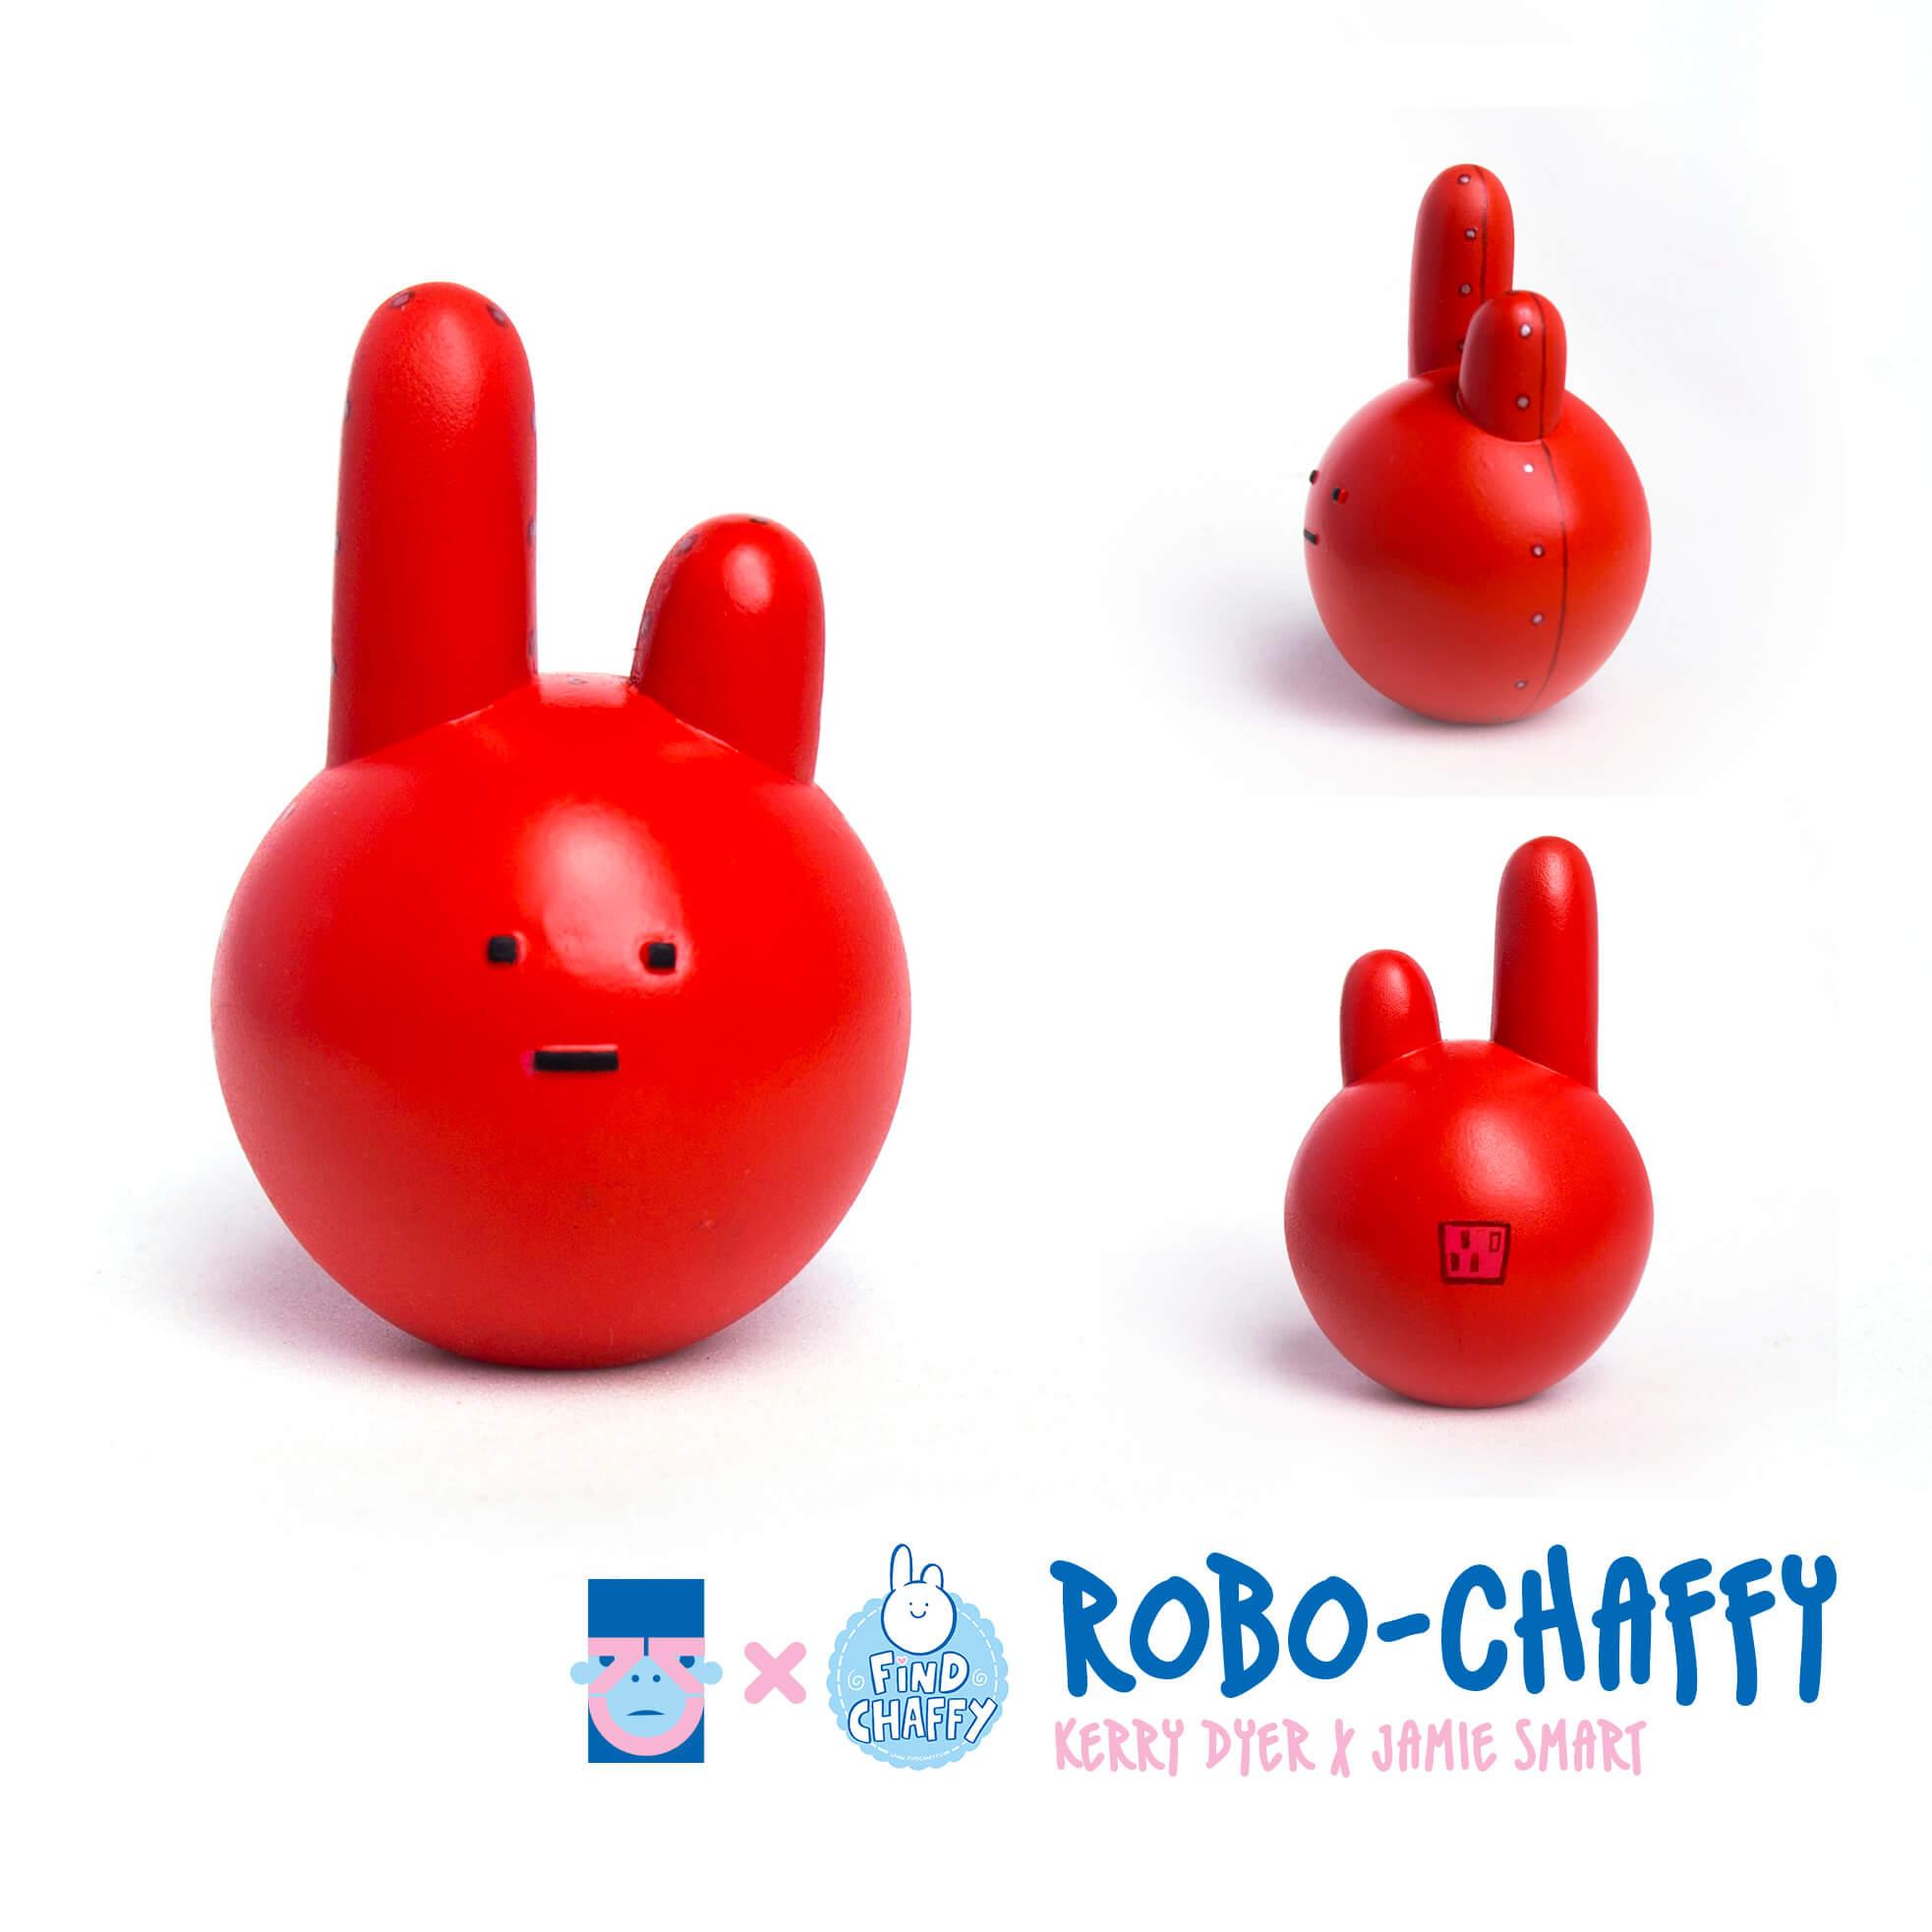 Red Robot Chaffy1 insta2